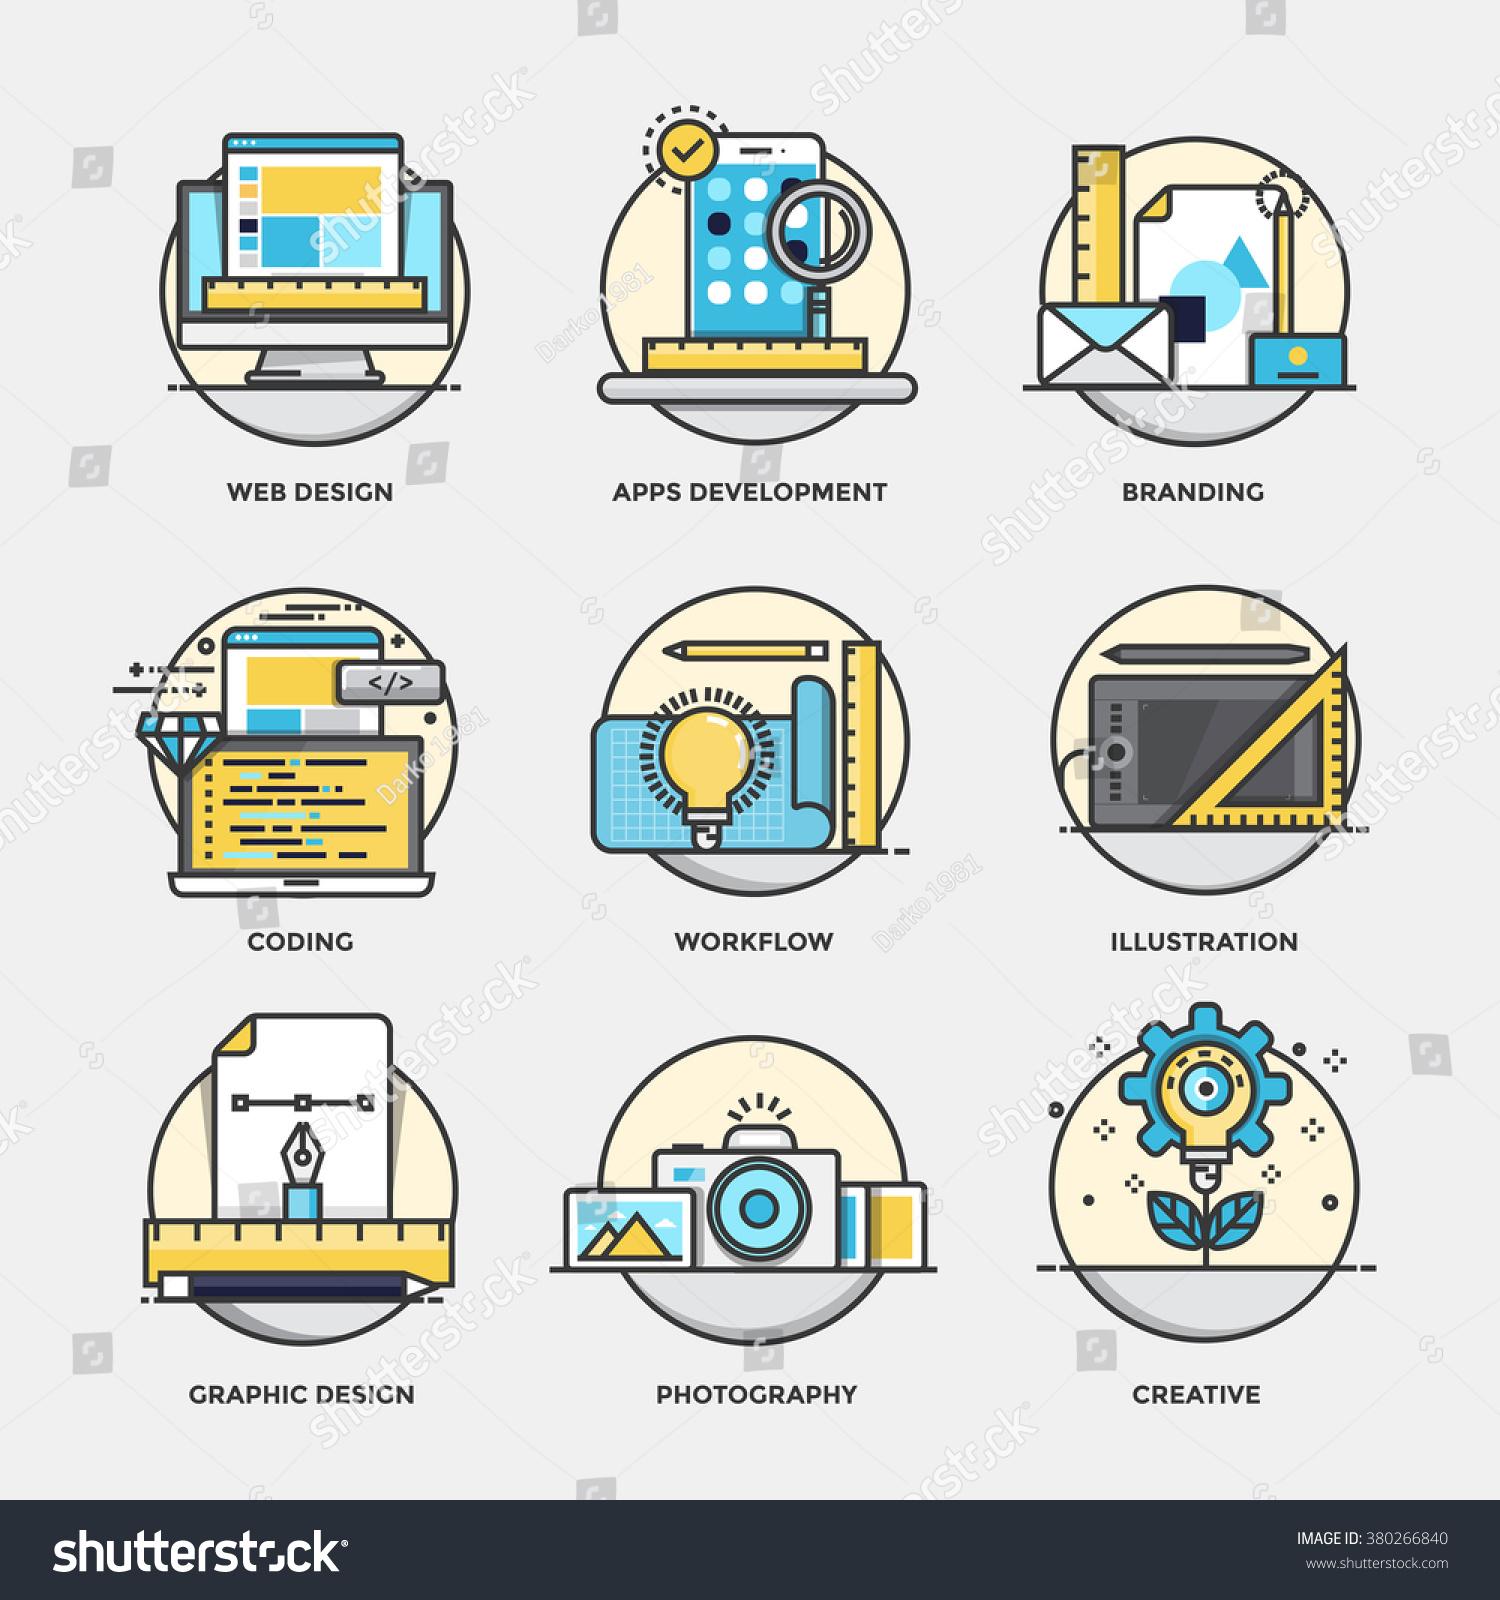 Modern colors web design - Modern Flat Color Line Designed Concepts Icons For Branding Graphic Design Web Design